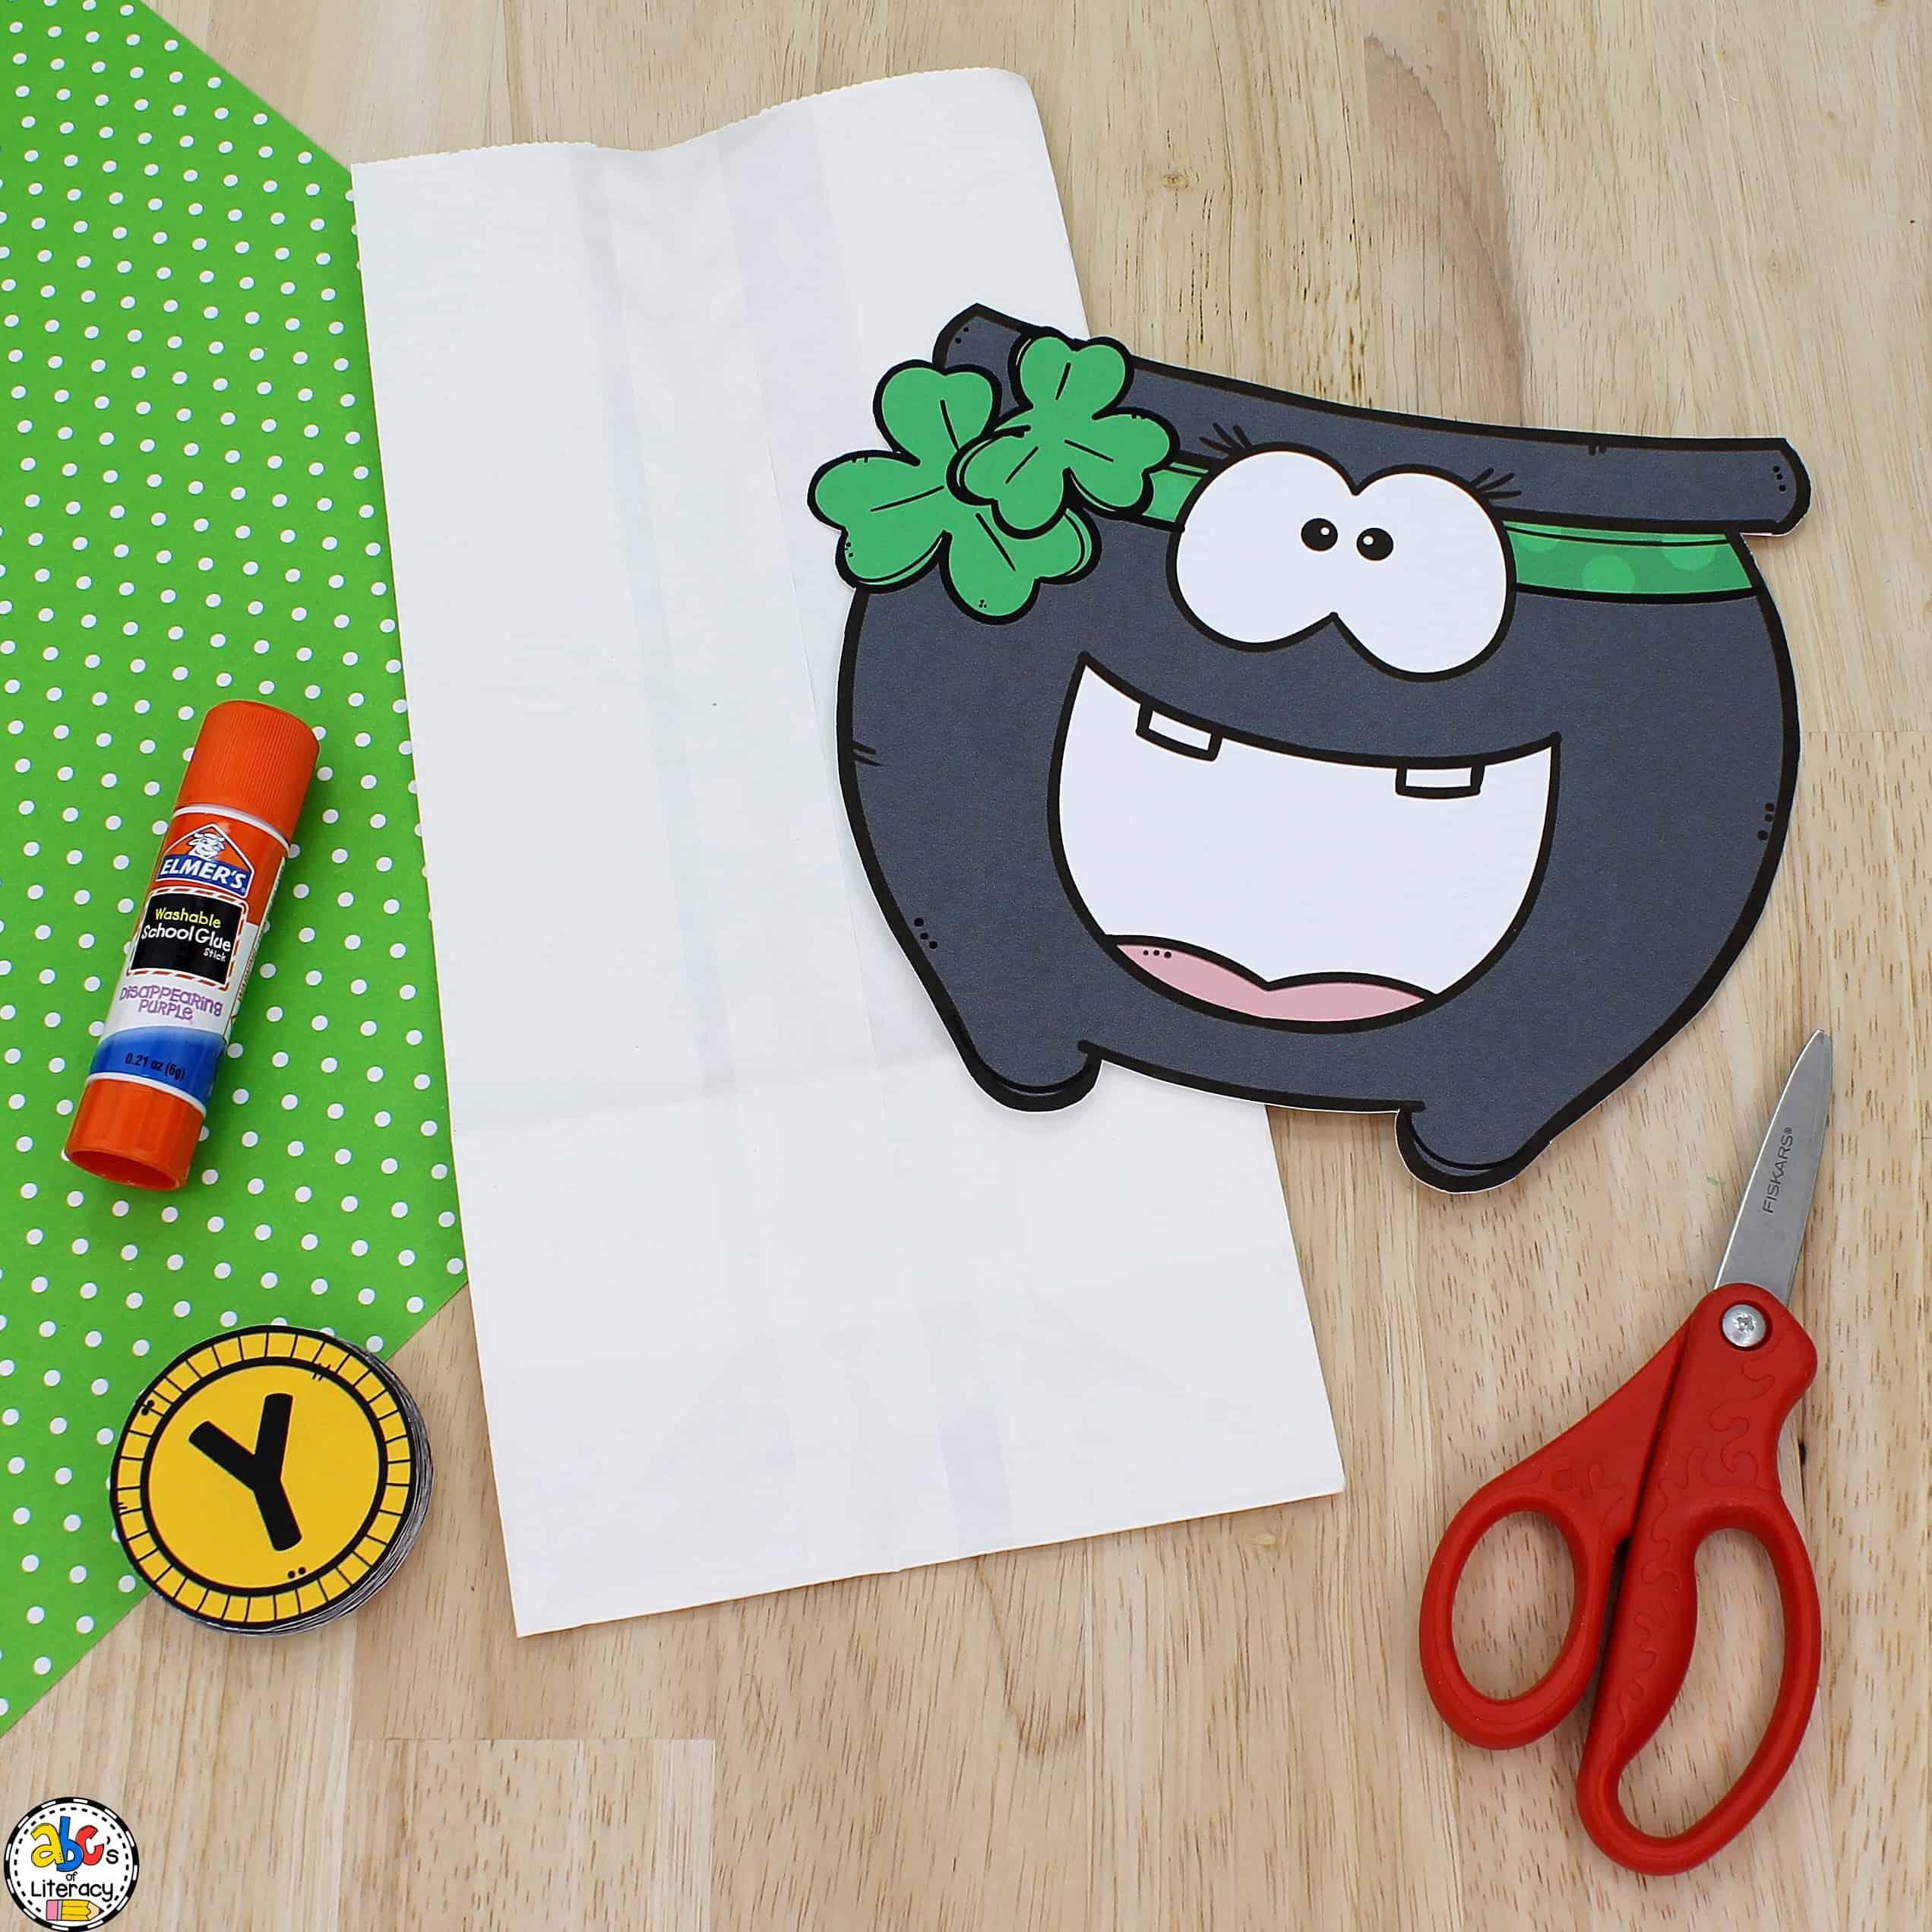 St. Patrick's Day Literacy Activity